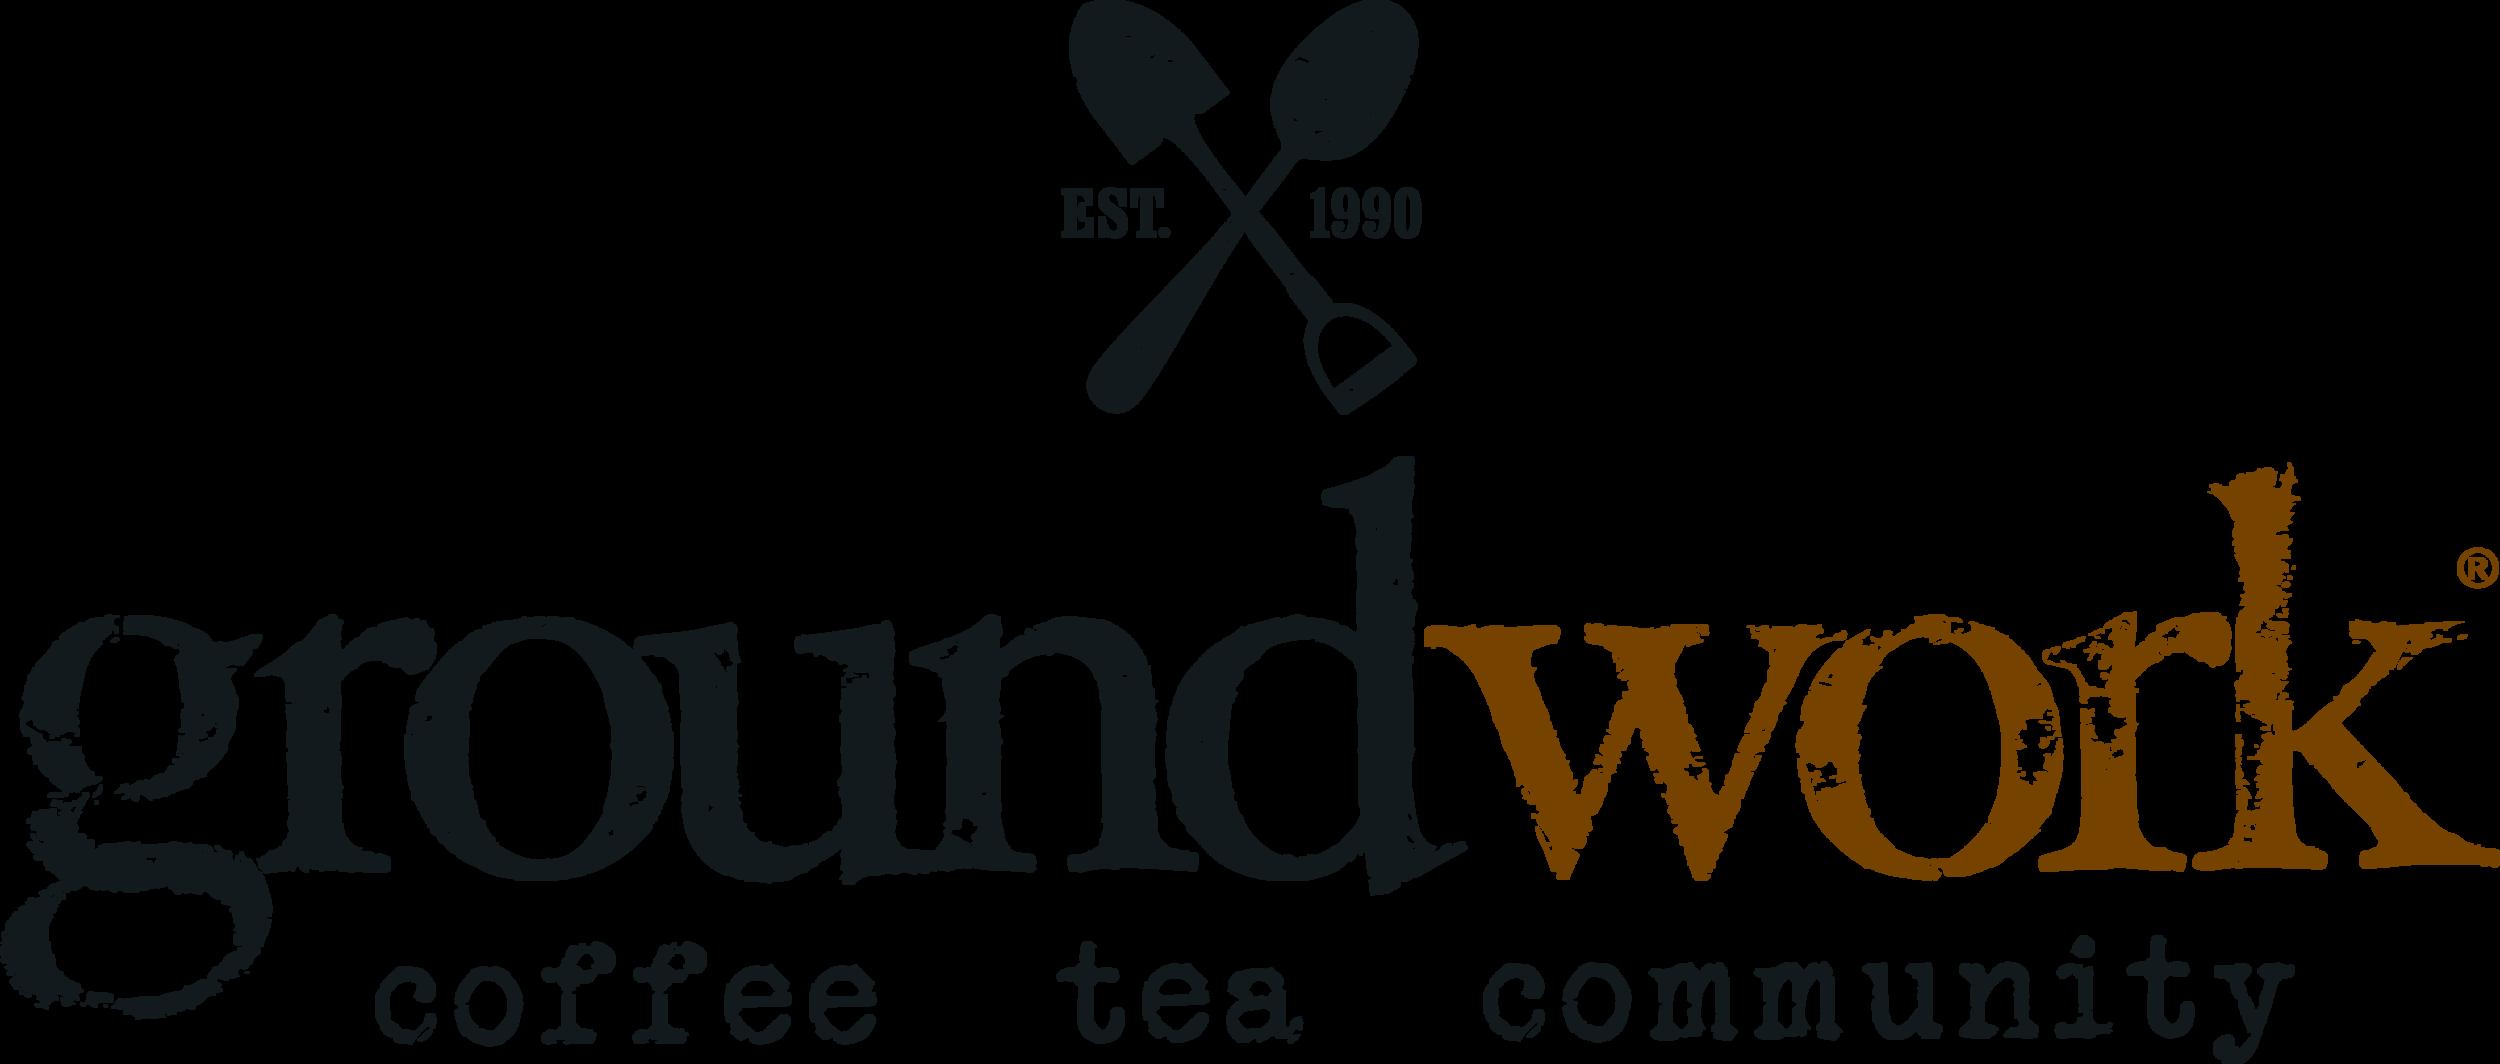 groundworkcoffee